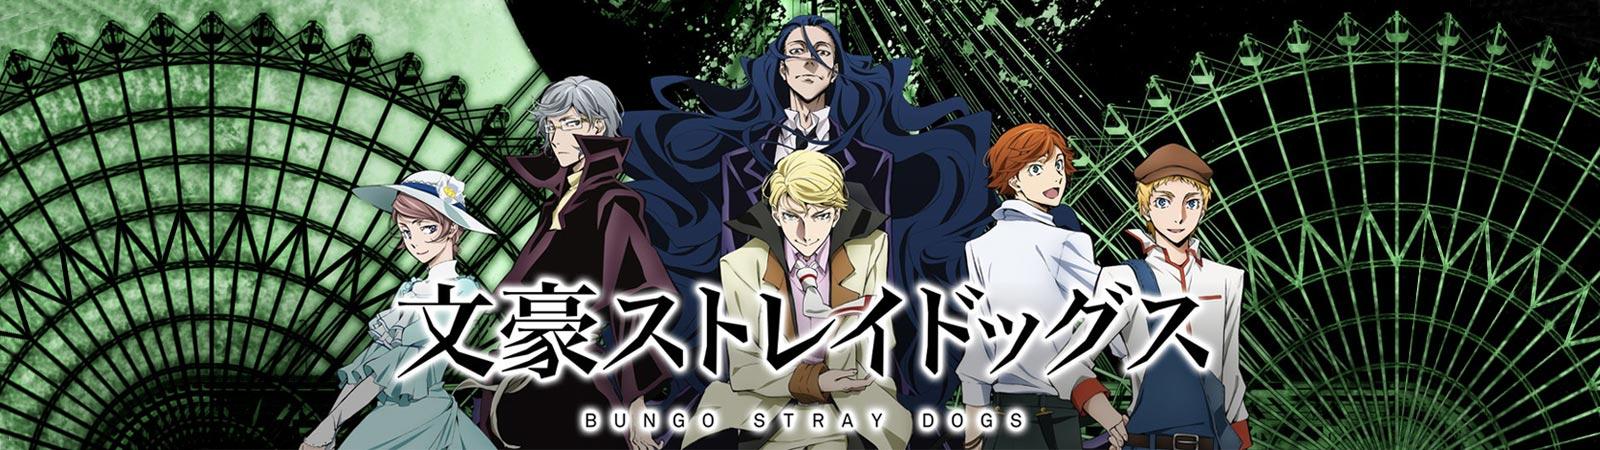 Tập 4 - Bungou Stray Dogs - Season 2